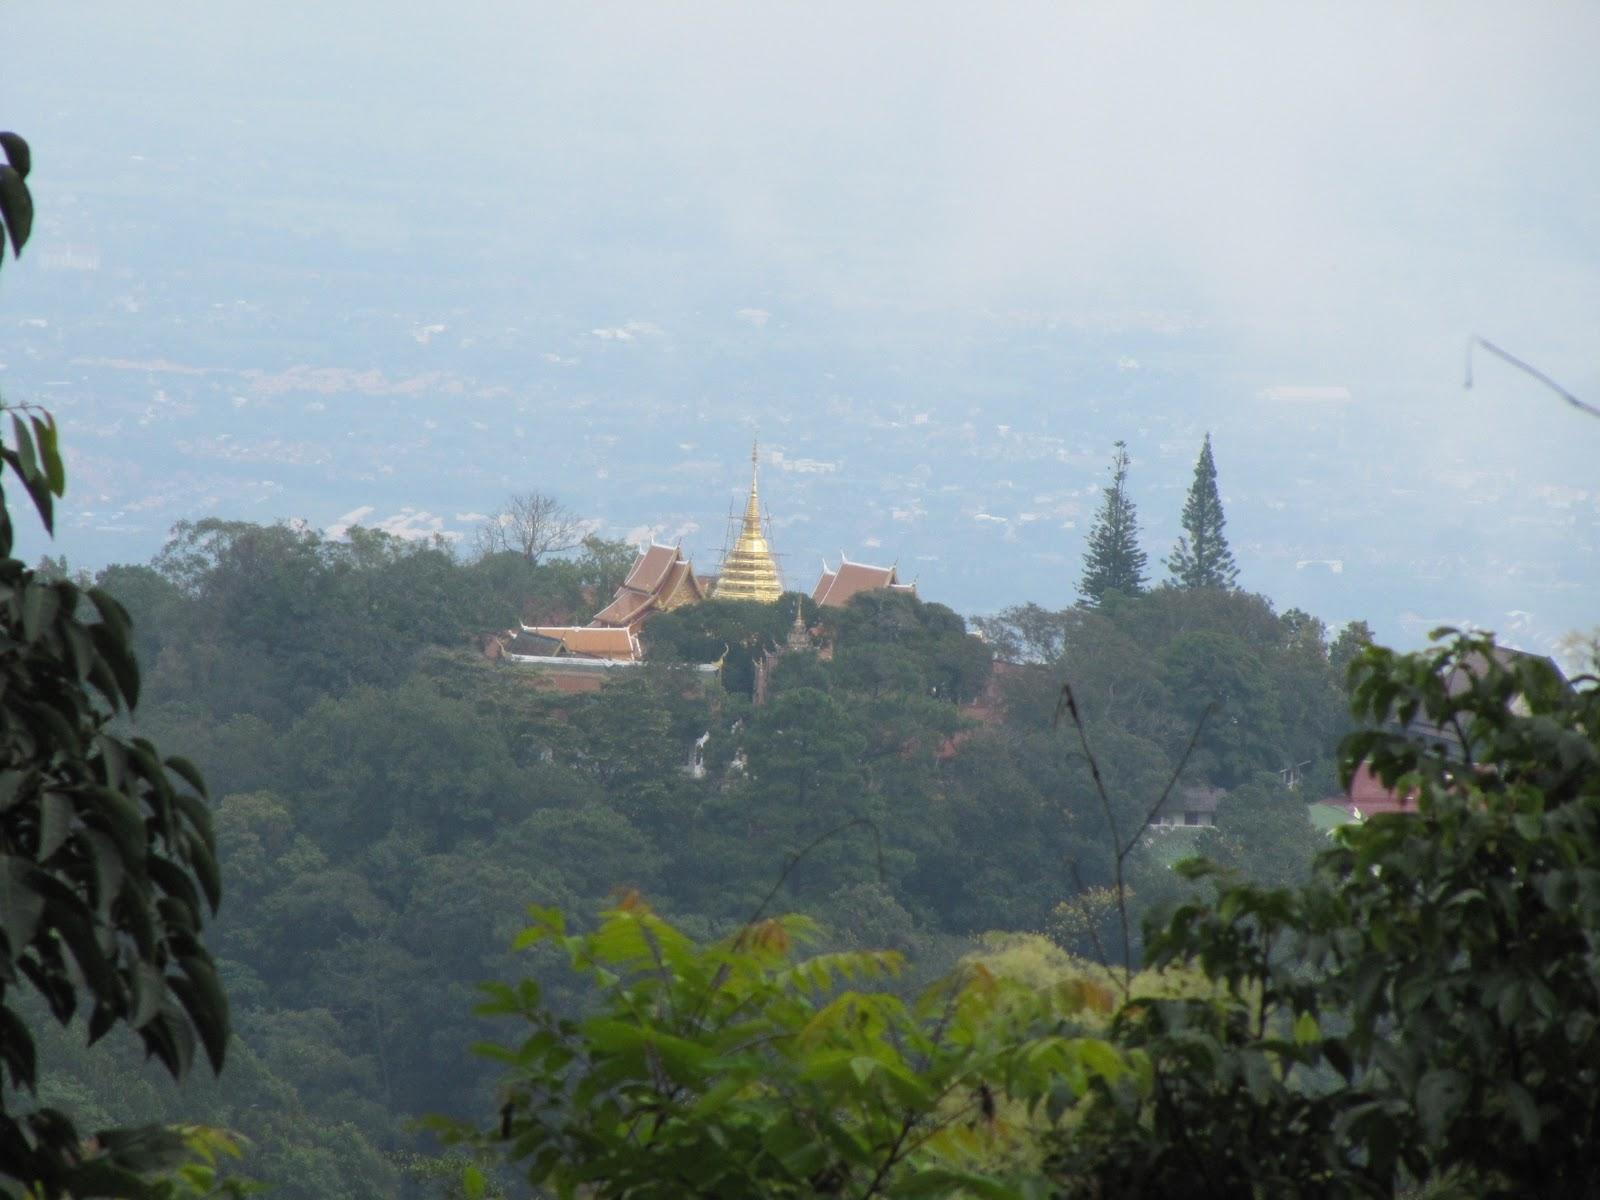 Climbing Doi Suthep Mountain and Doi Pui  A Teachers Journey